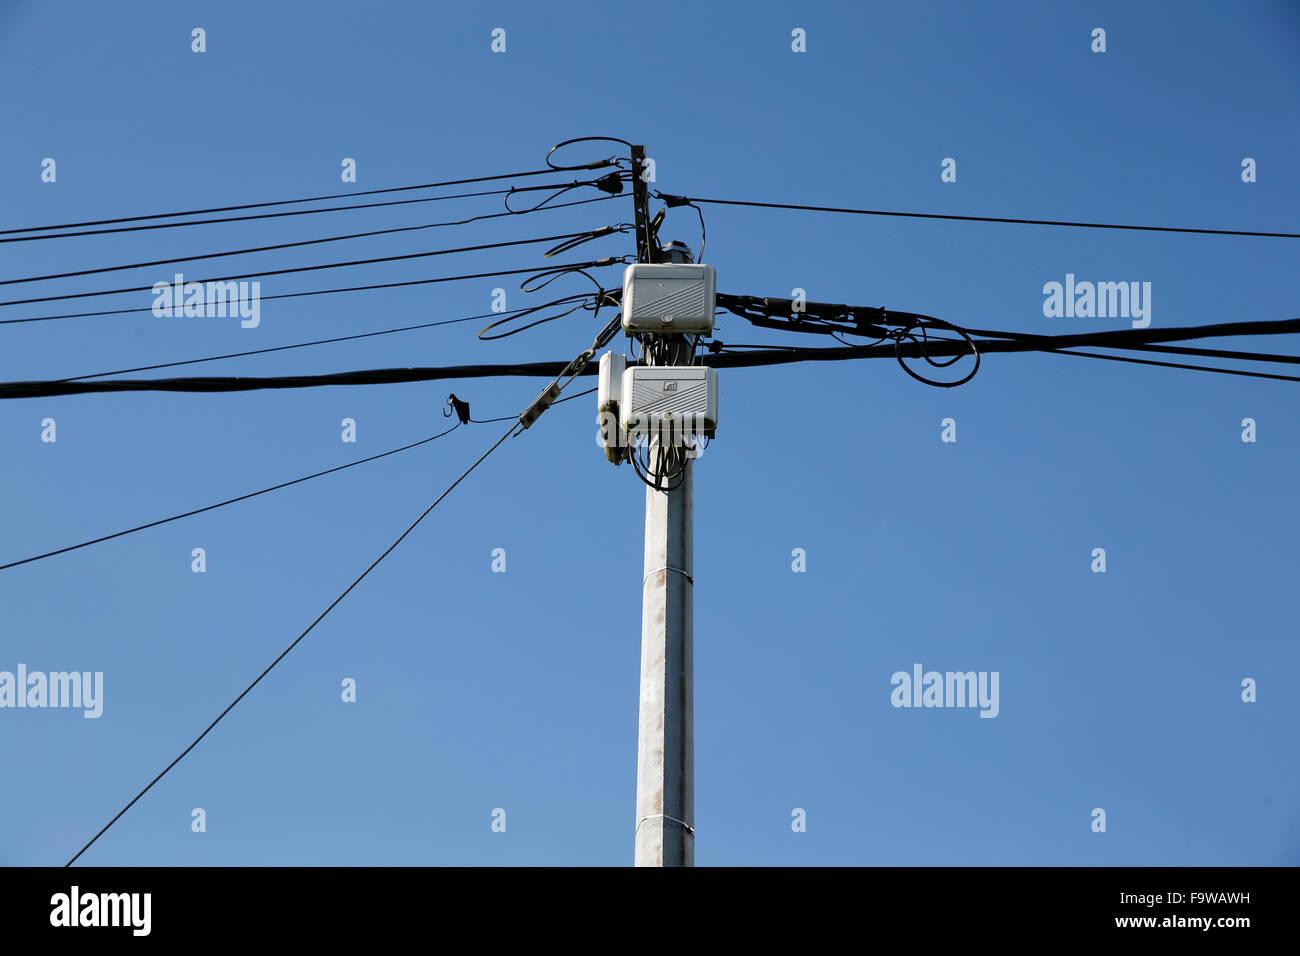 Elektrische Verdrahtung. Stockbild